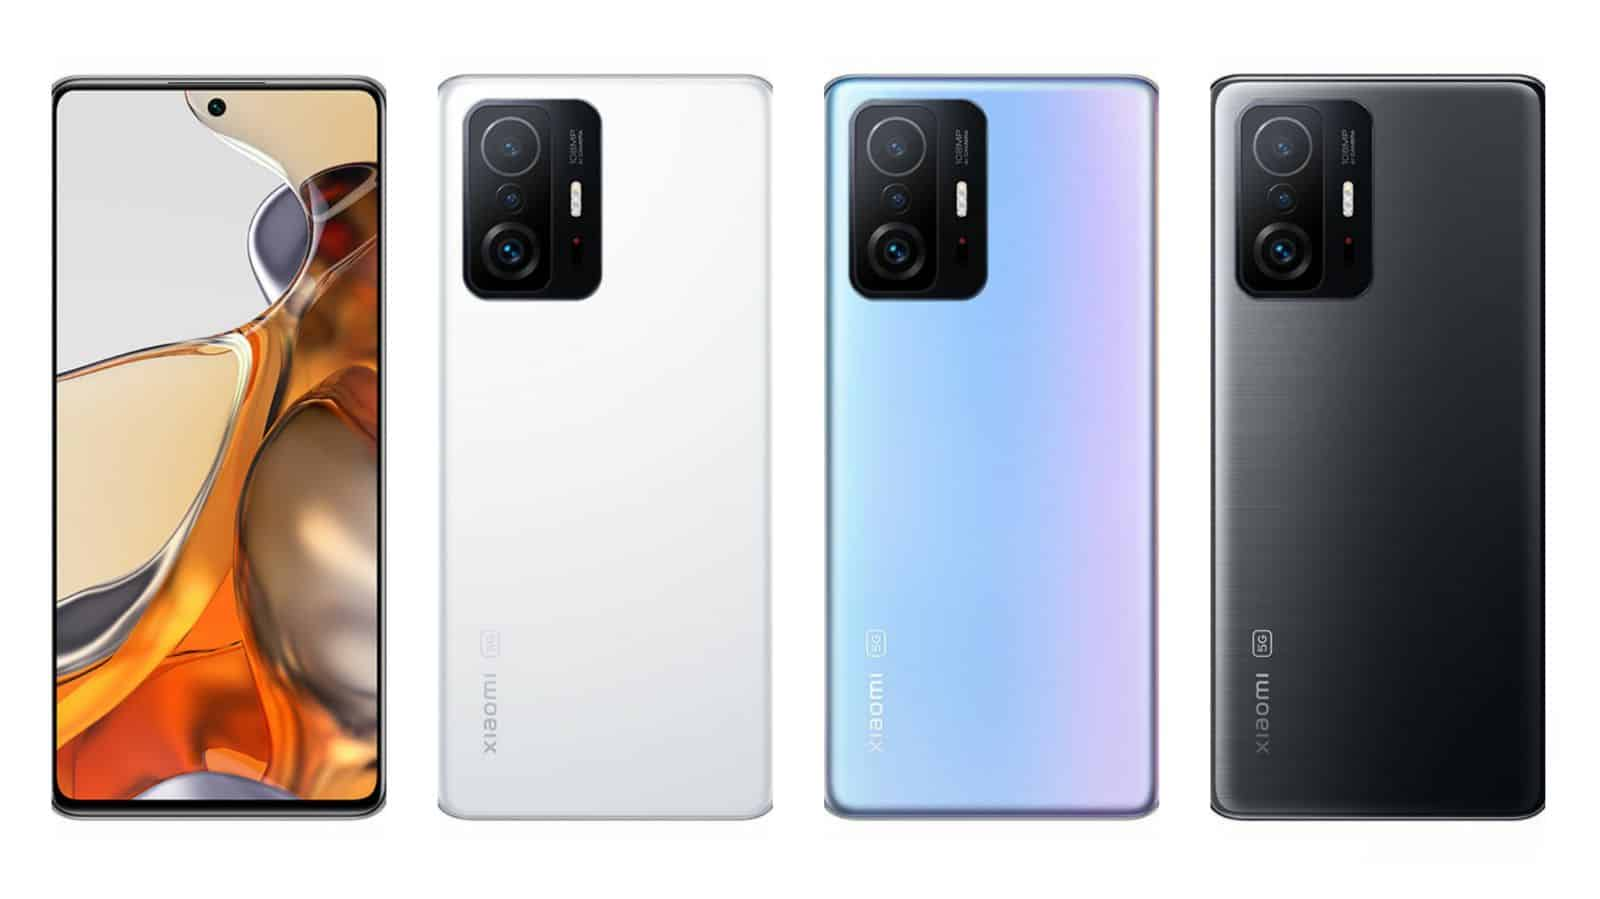 xiaomi-11T-pro-smartphone-milieu-de-gamme